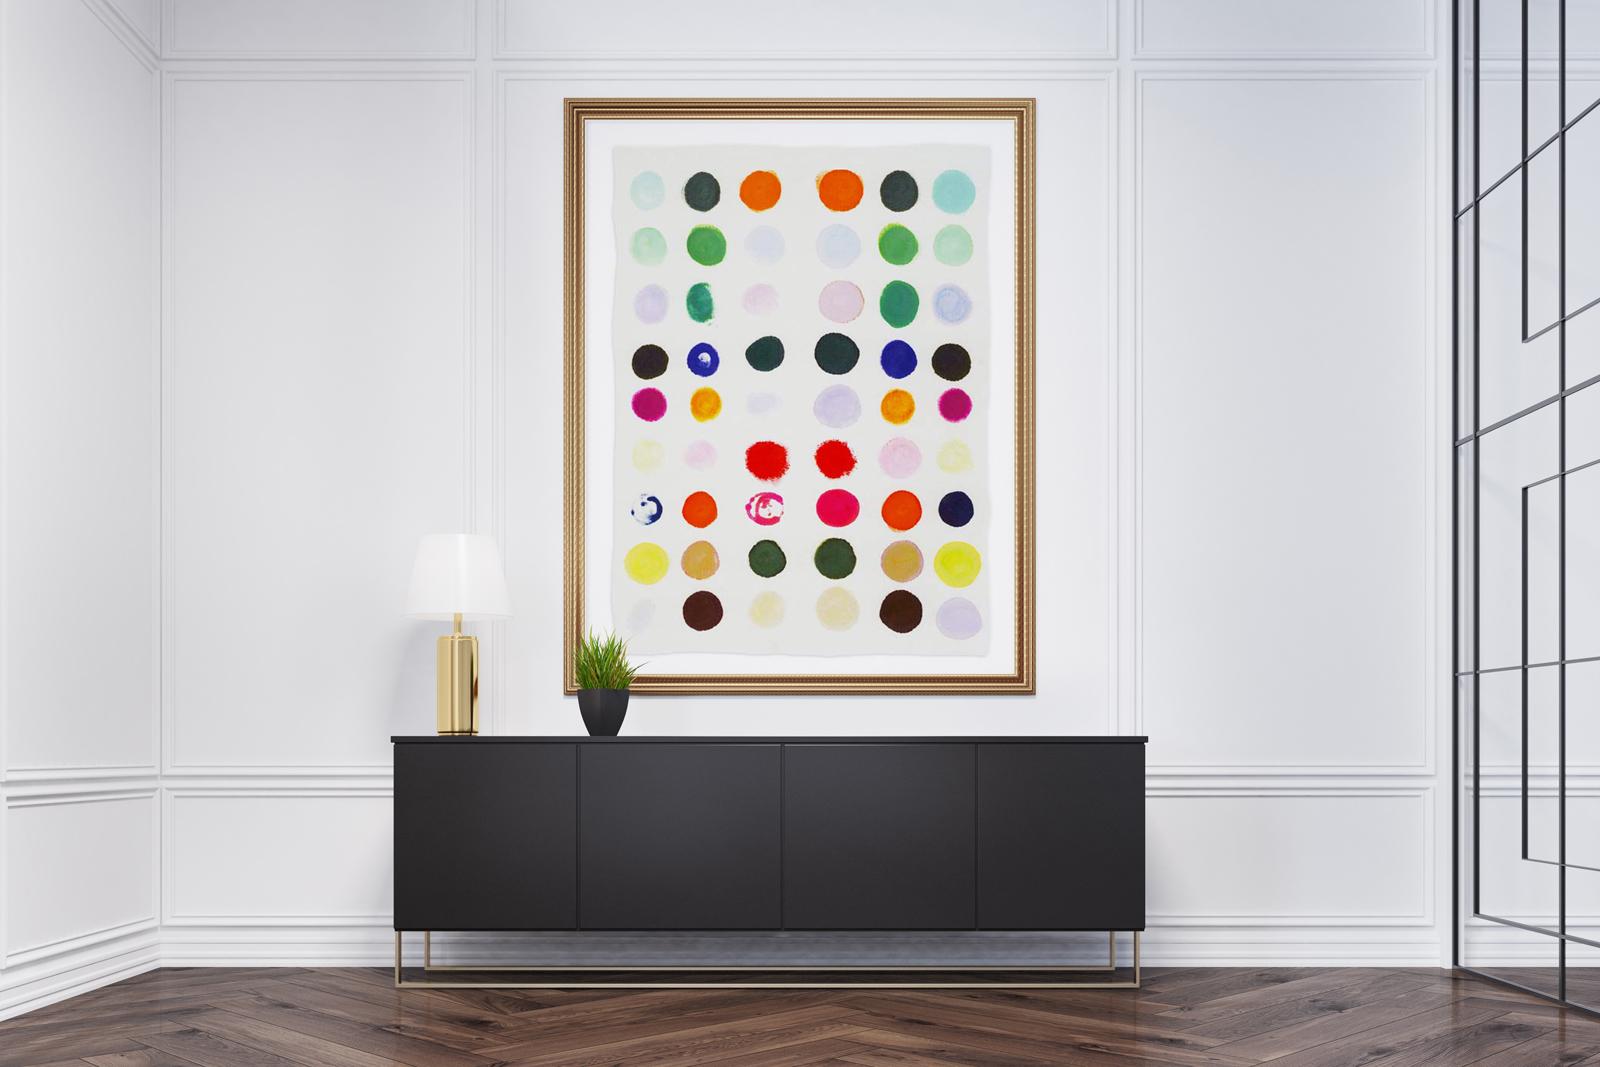 Kristi-Kohut-art-homes-colorful896.jpg